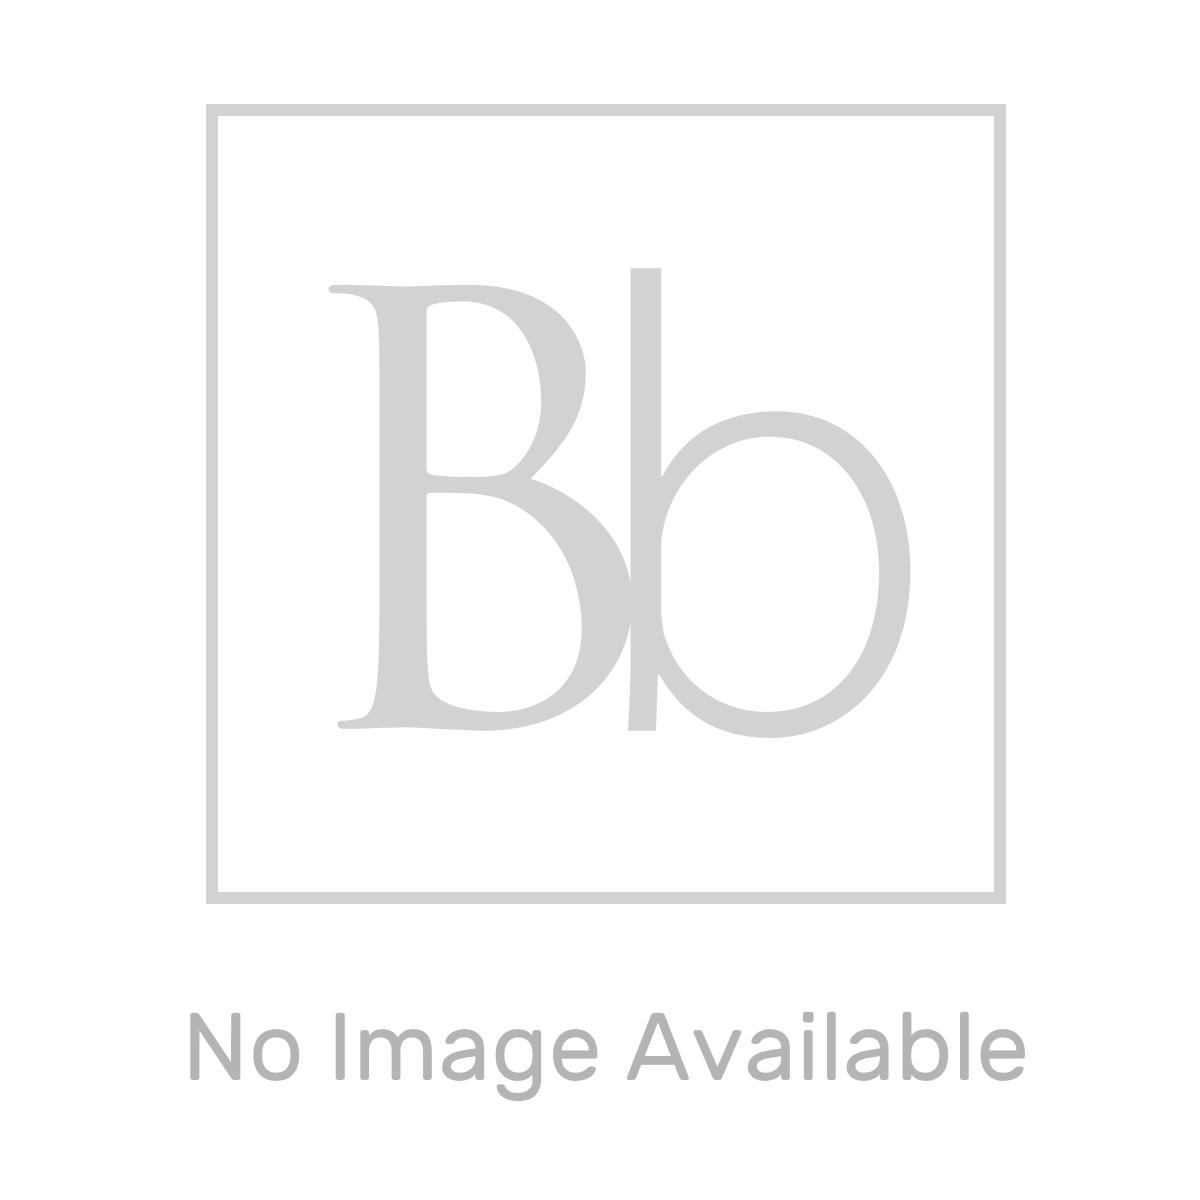 Aquadart Black Slate Shower Tray 1200 x 700 Overhead